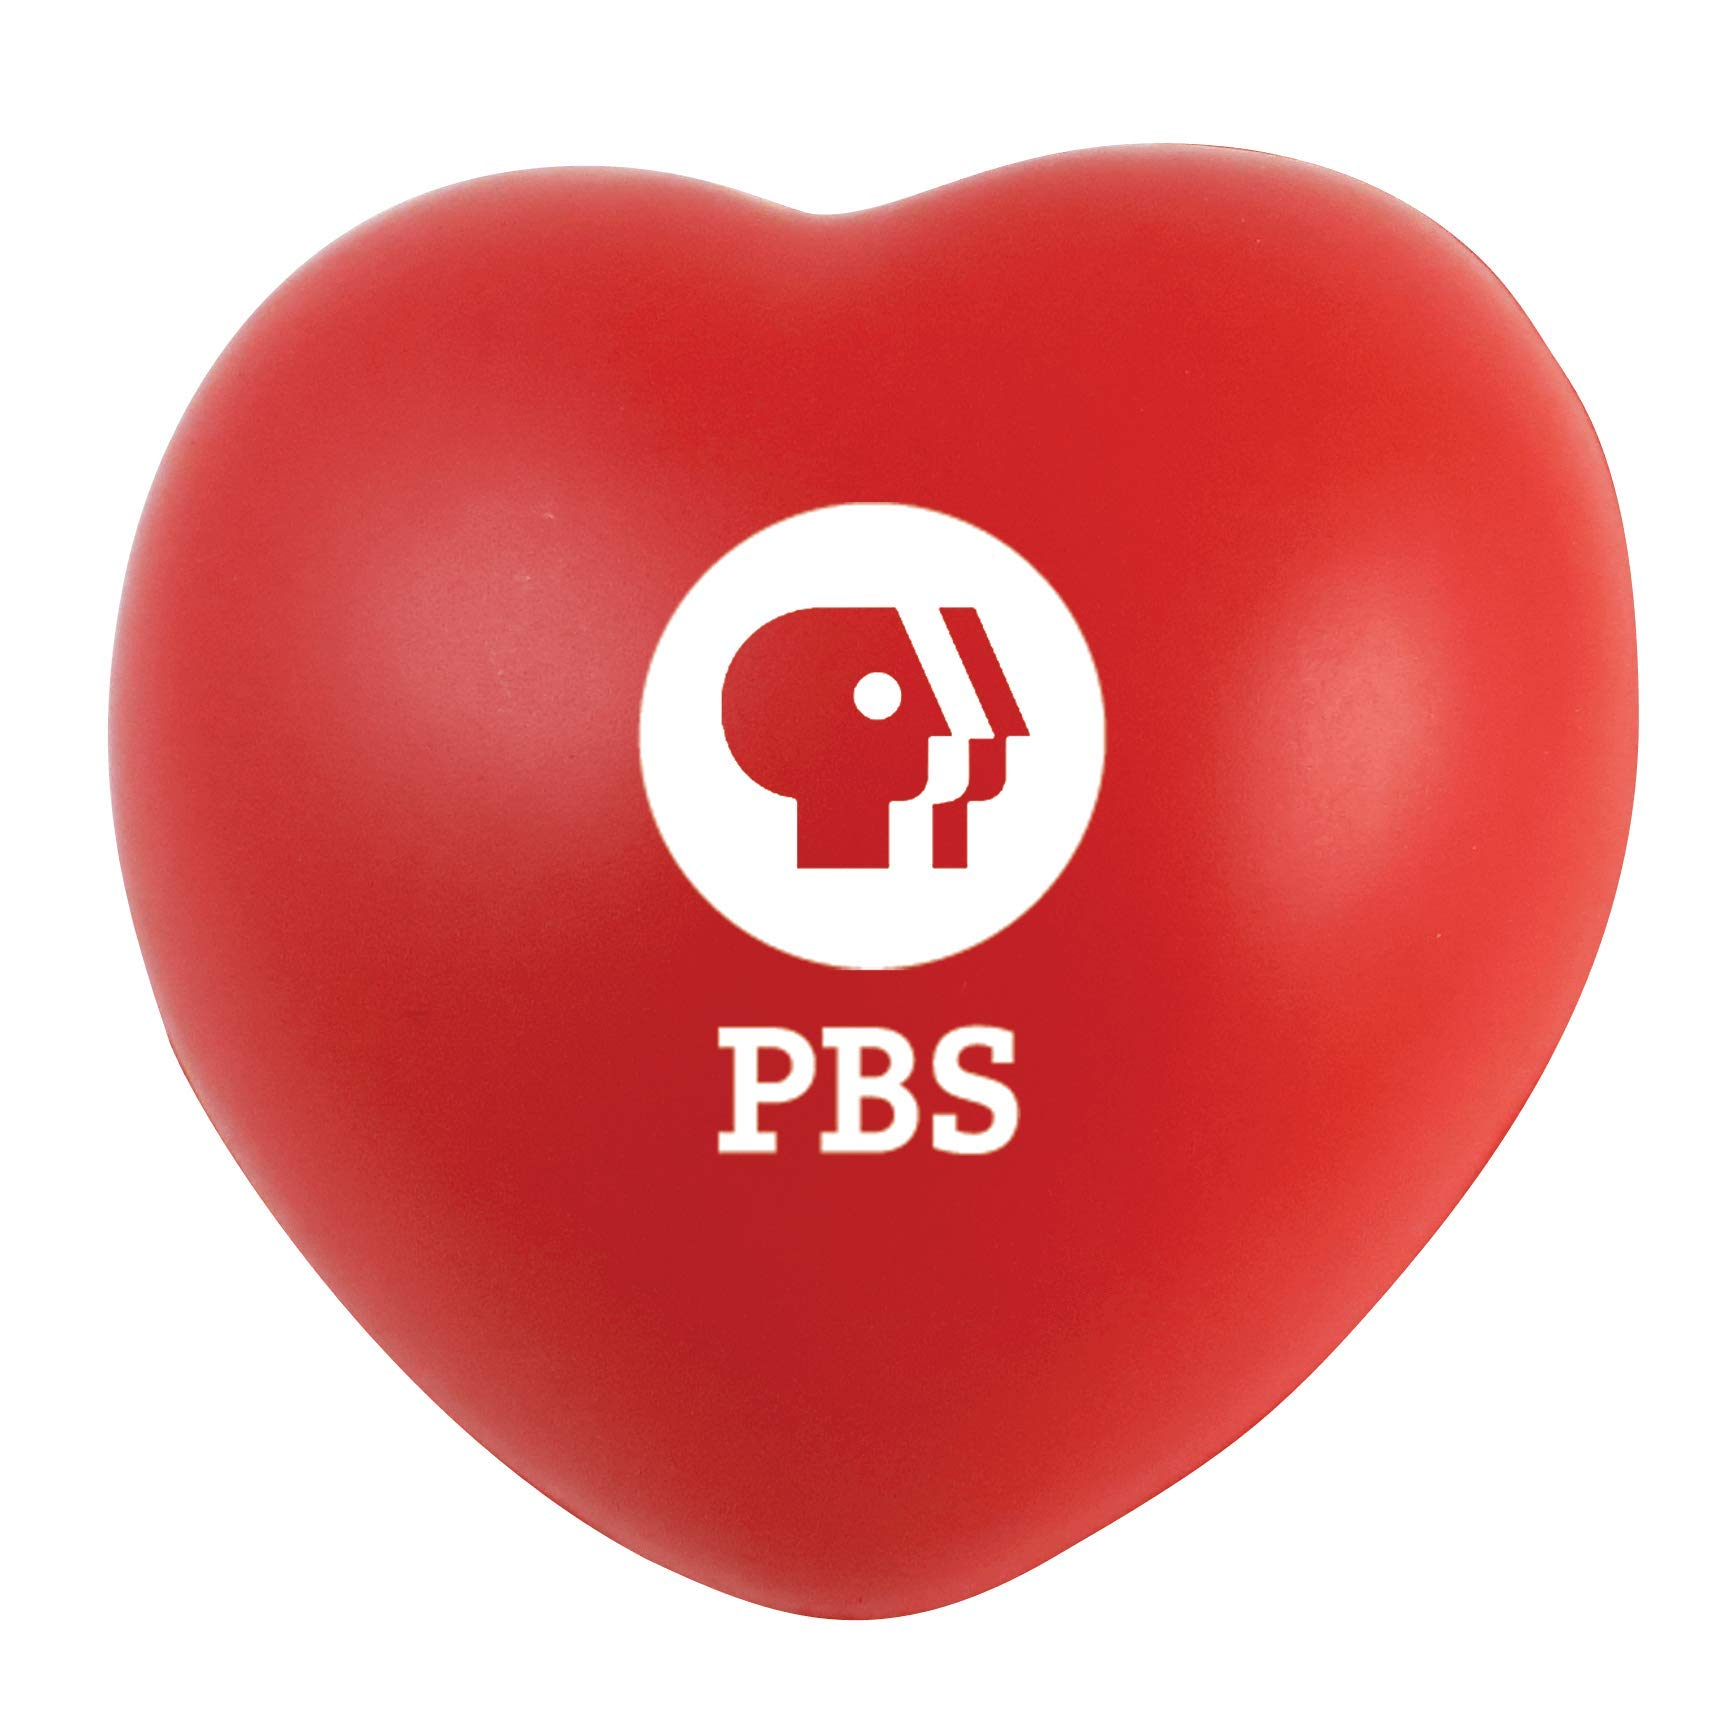 Kayzee Heart Stressball – 200 Quantity – 1.10 Each/Promotional/Bulk with Your Logo/Customized